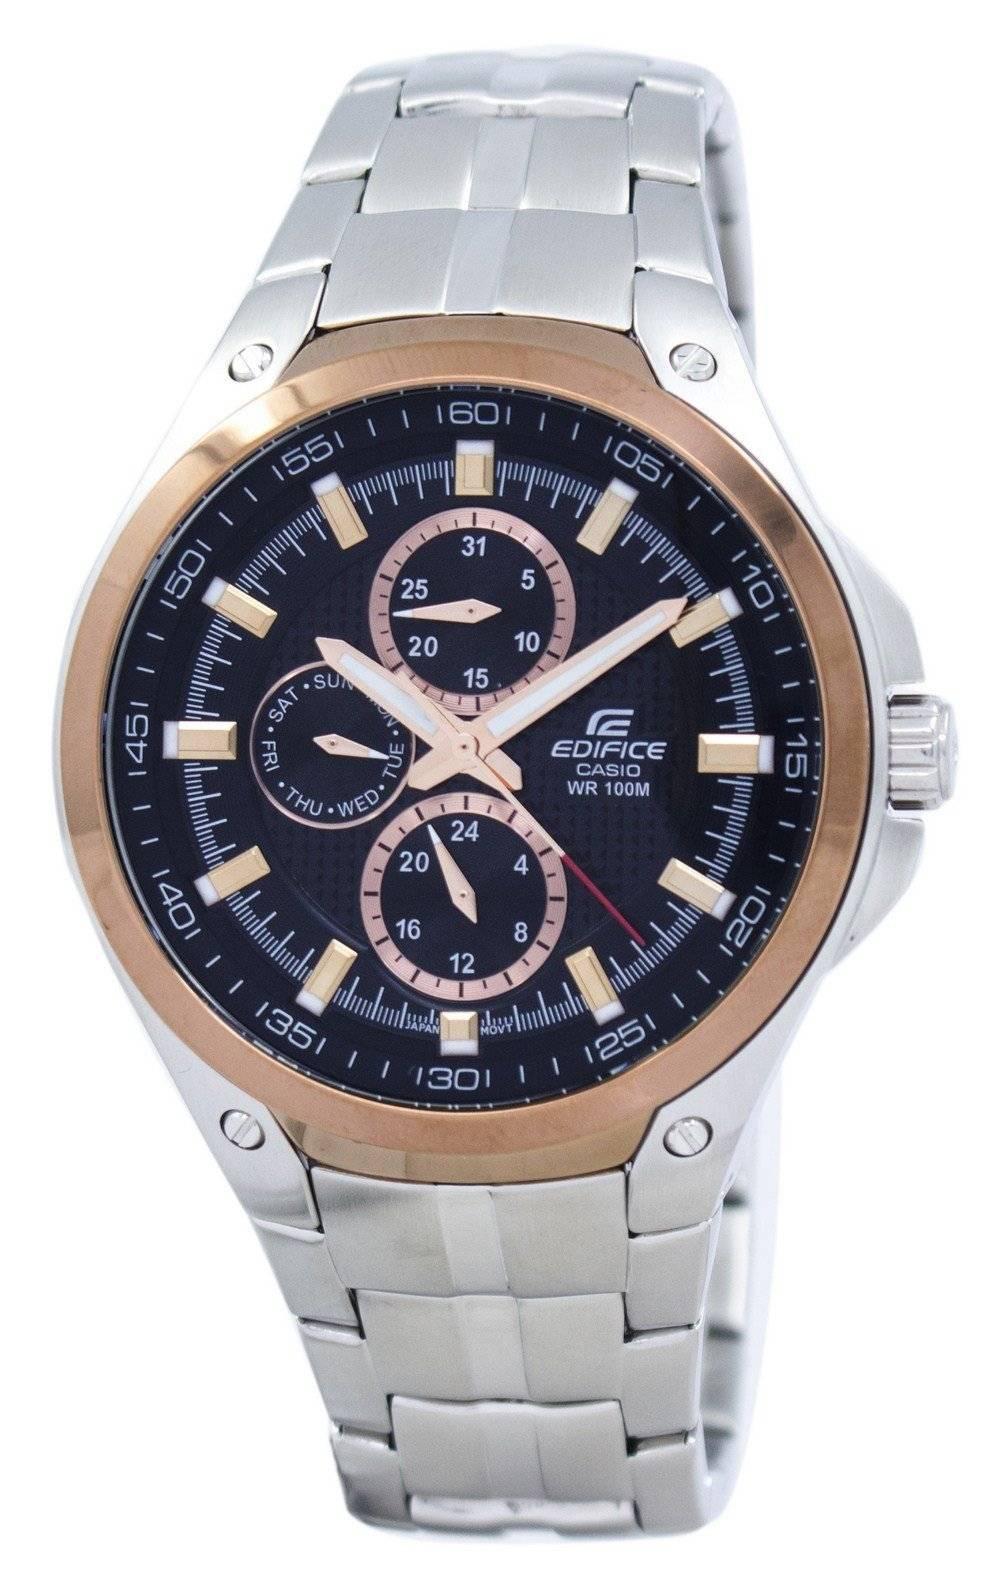 9c333487cf0b Details about Casio Edifice EF-326D-1AVDF EF-326D-1AV EF-326D-1 Men s Watch